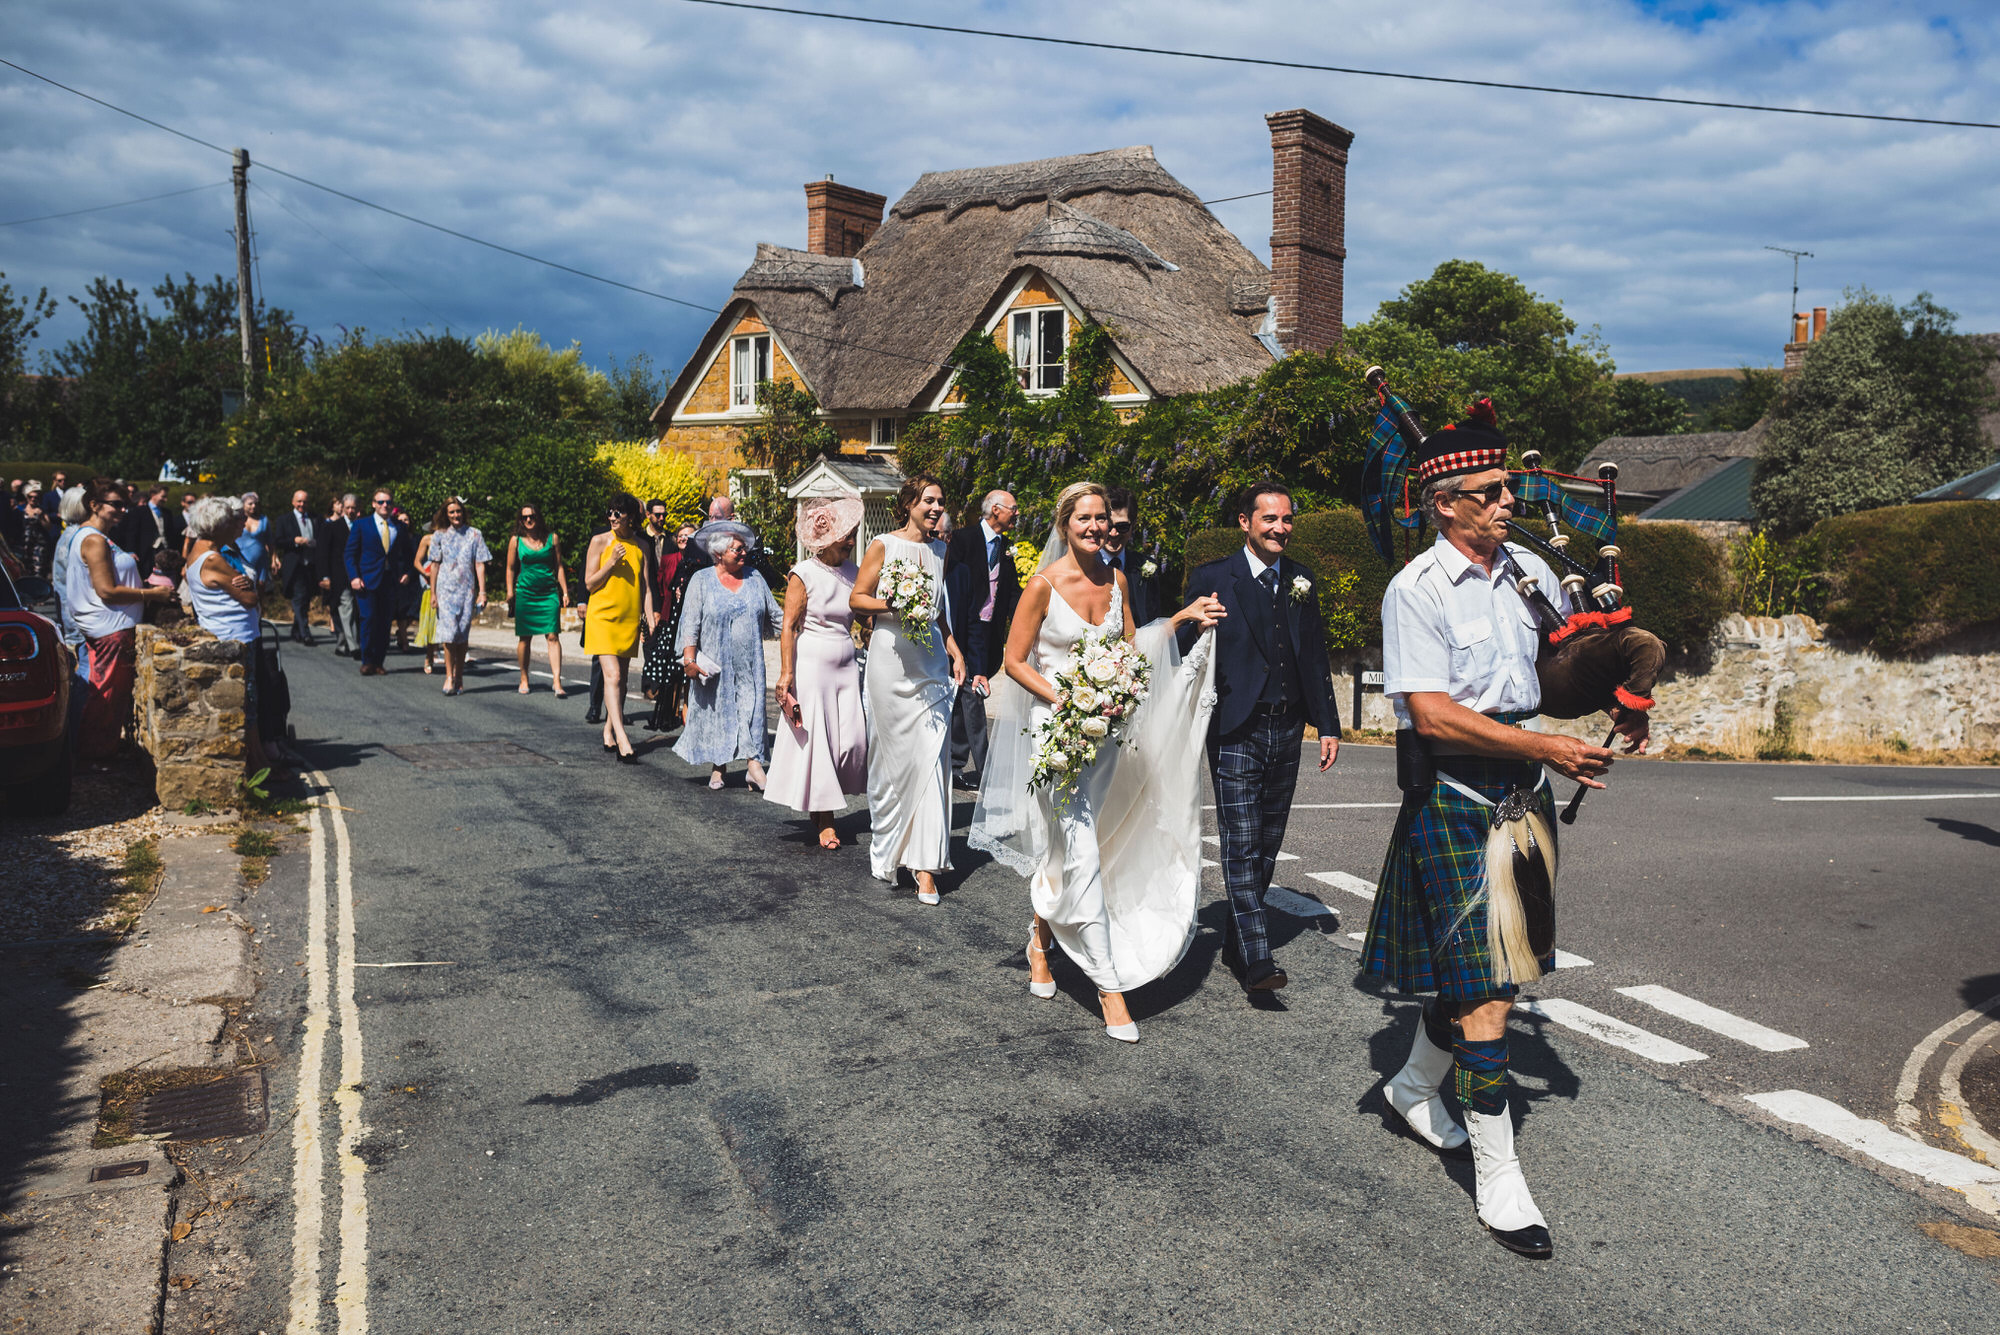 Dorset marquee wedding by the sea simon biffen photography 21